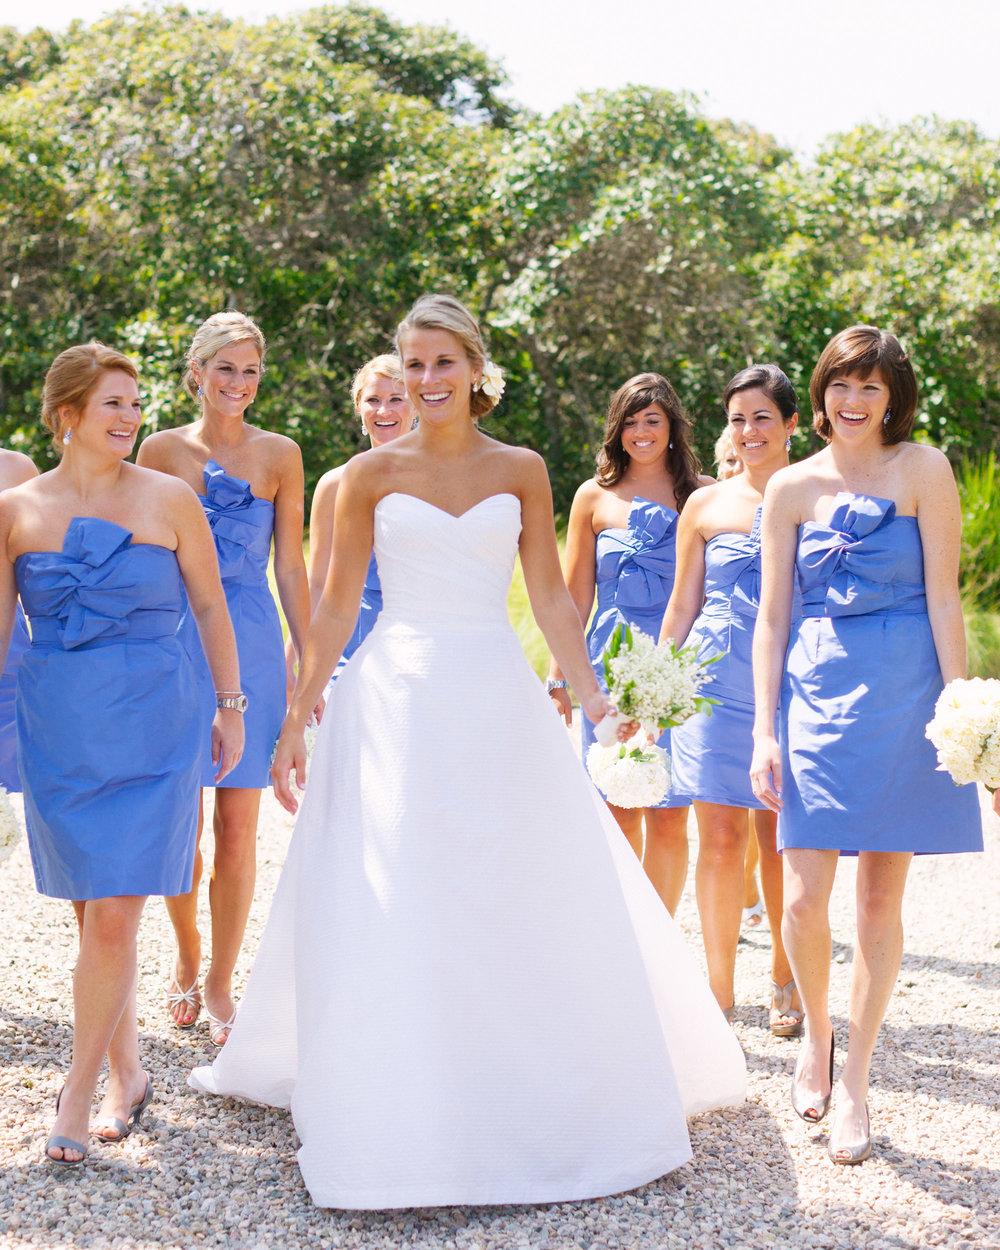 nantucket_siasconset_union_chapel_wedding_photos_11.jpg